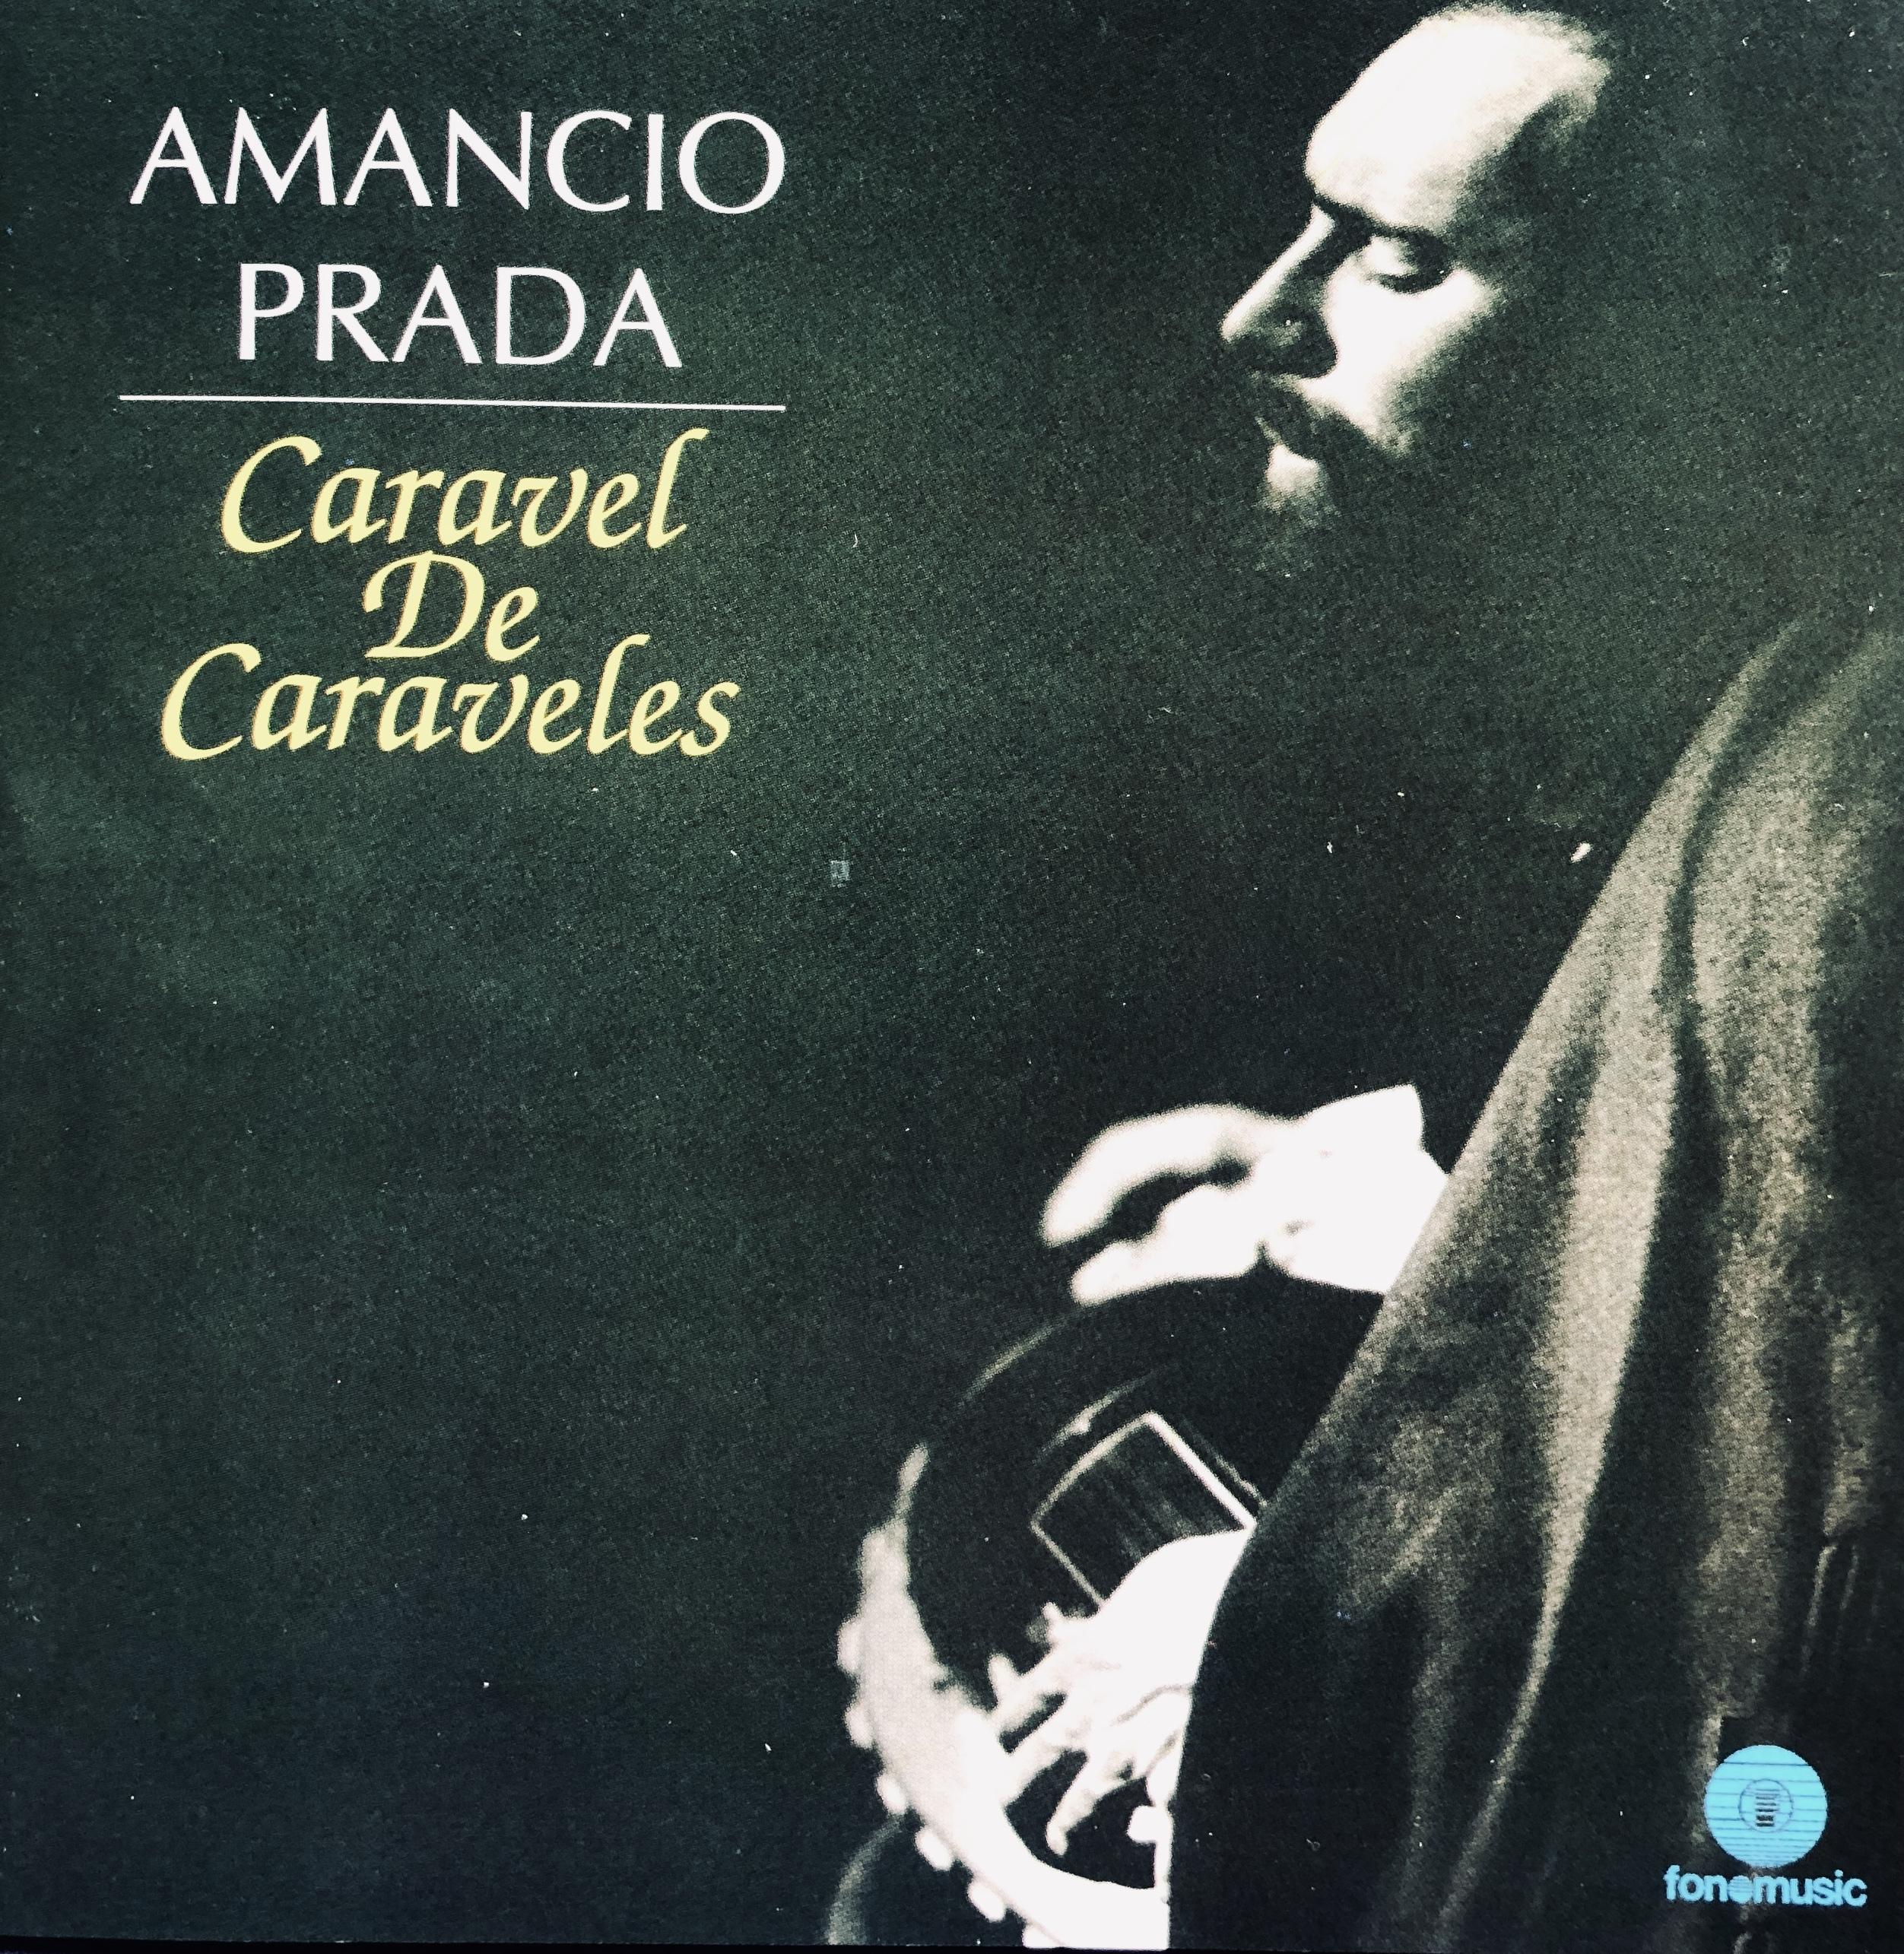 CARAVEL DE CARAVELES